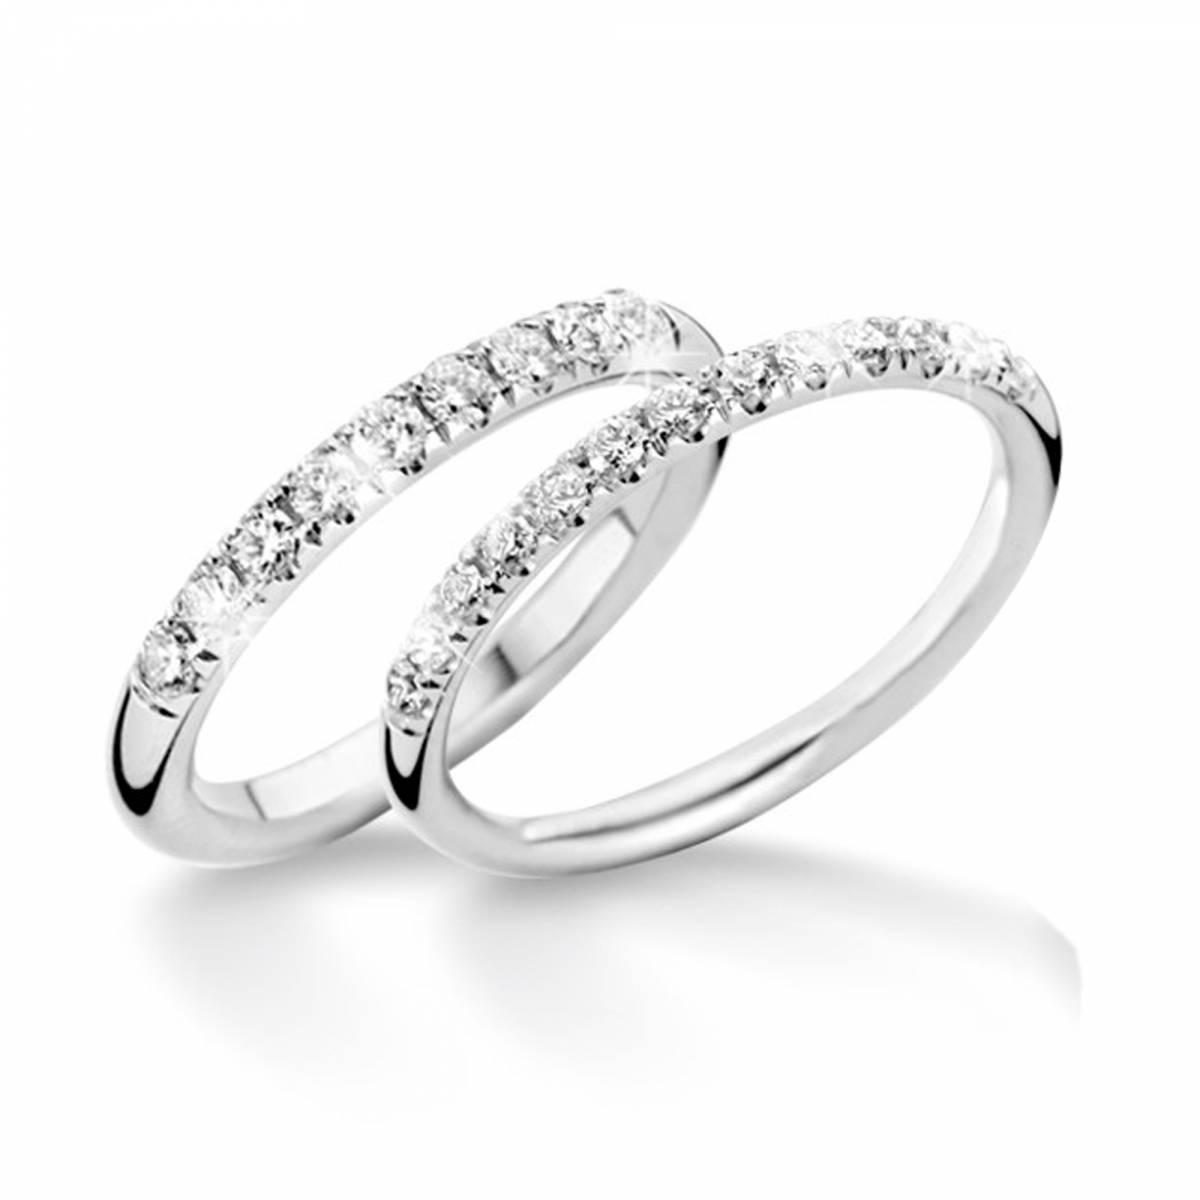 Juwelier Vandromme - Bruidsjuwelen - Juwelen - trouwring - verlovingsring - House of Weddings - Foto 1